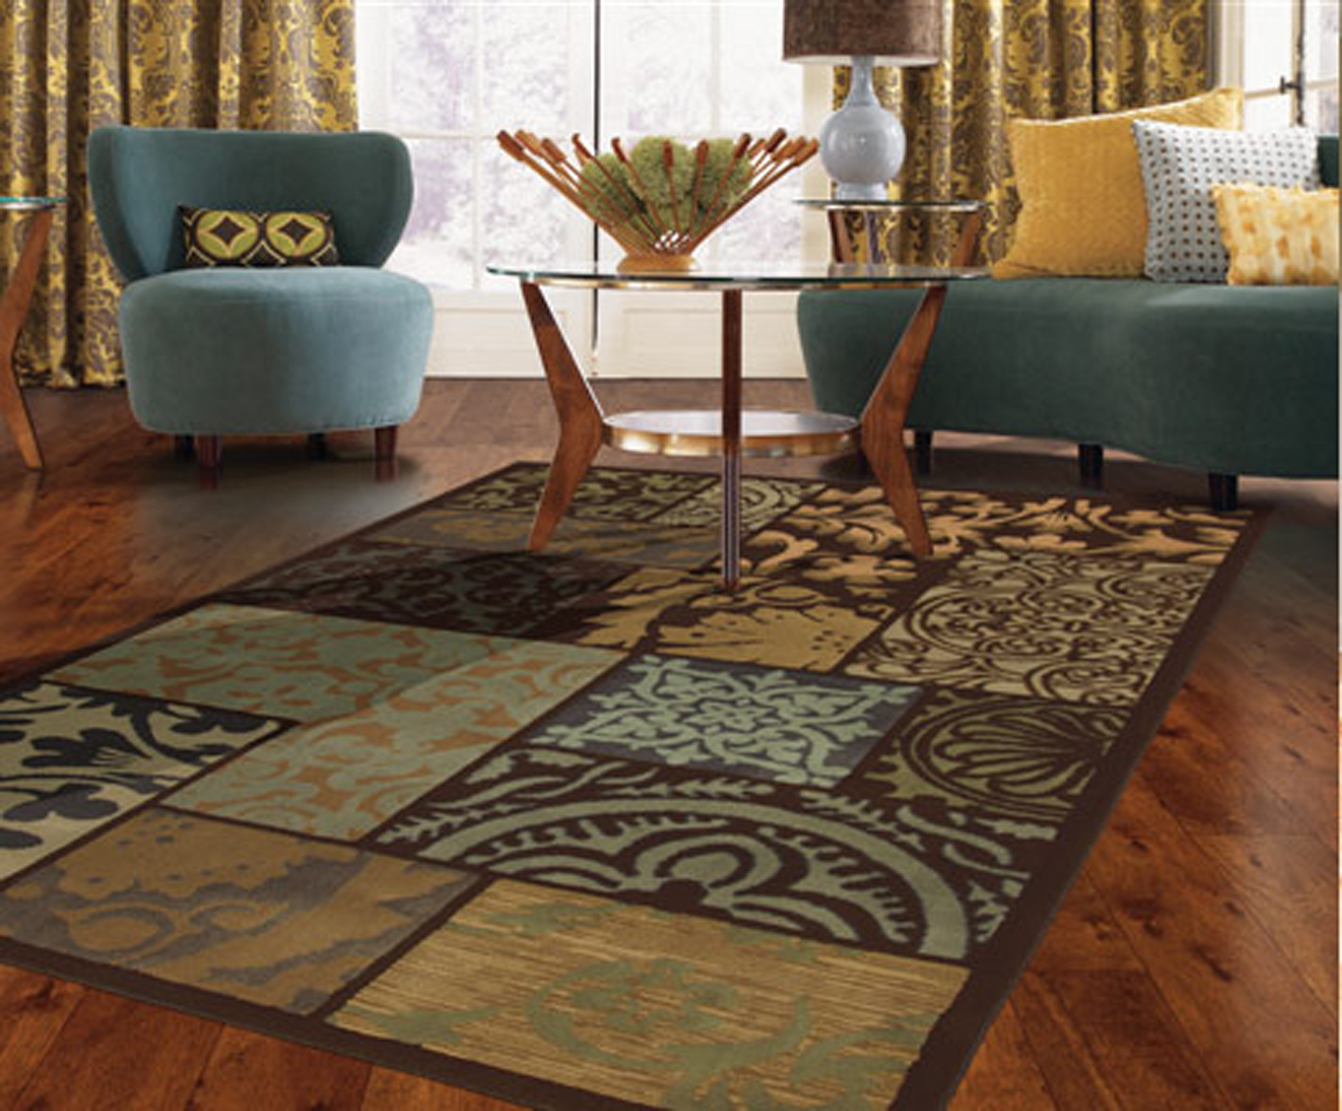 area_rugs  Mid City Carpets  Interiors  Sudbury Ontario